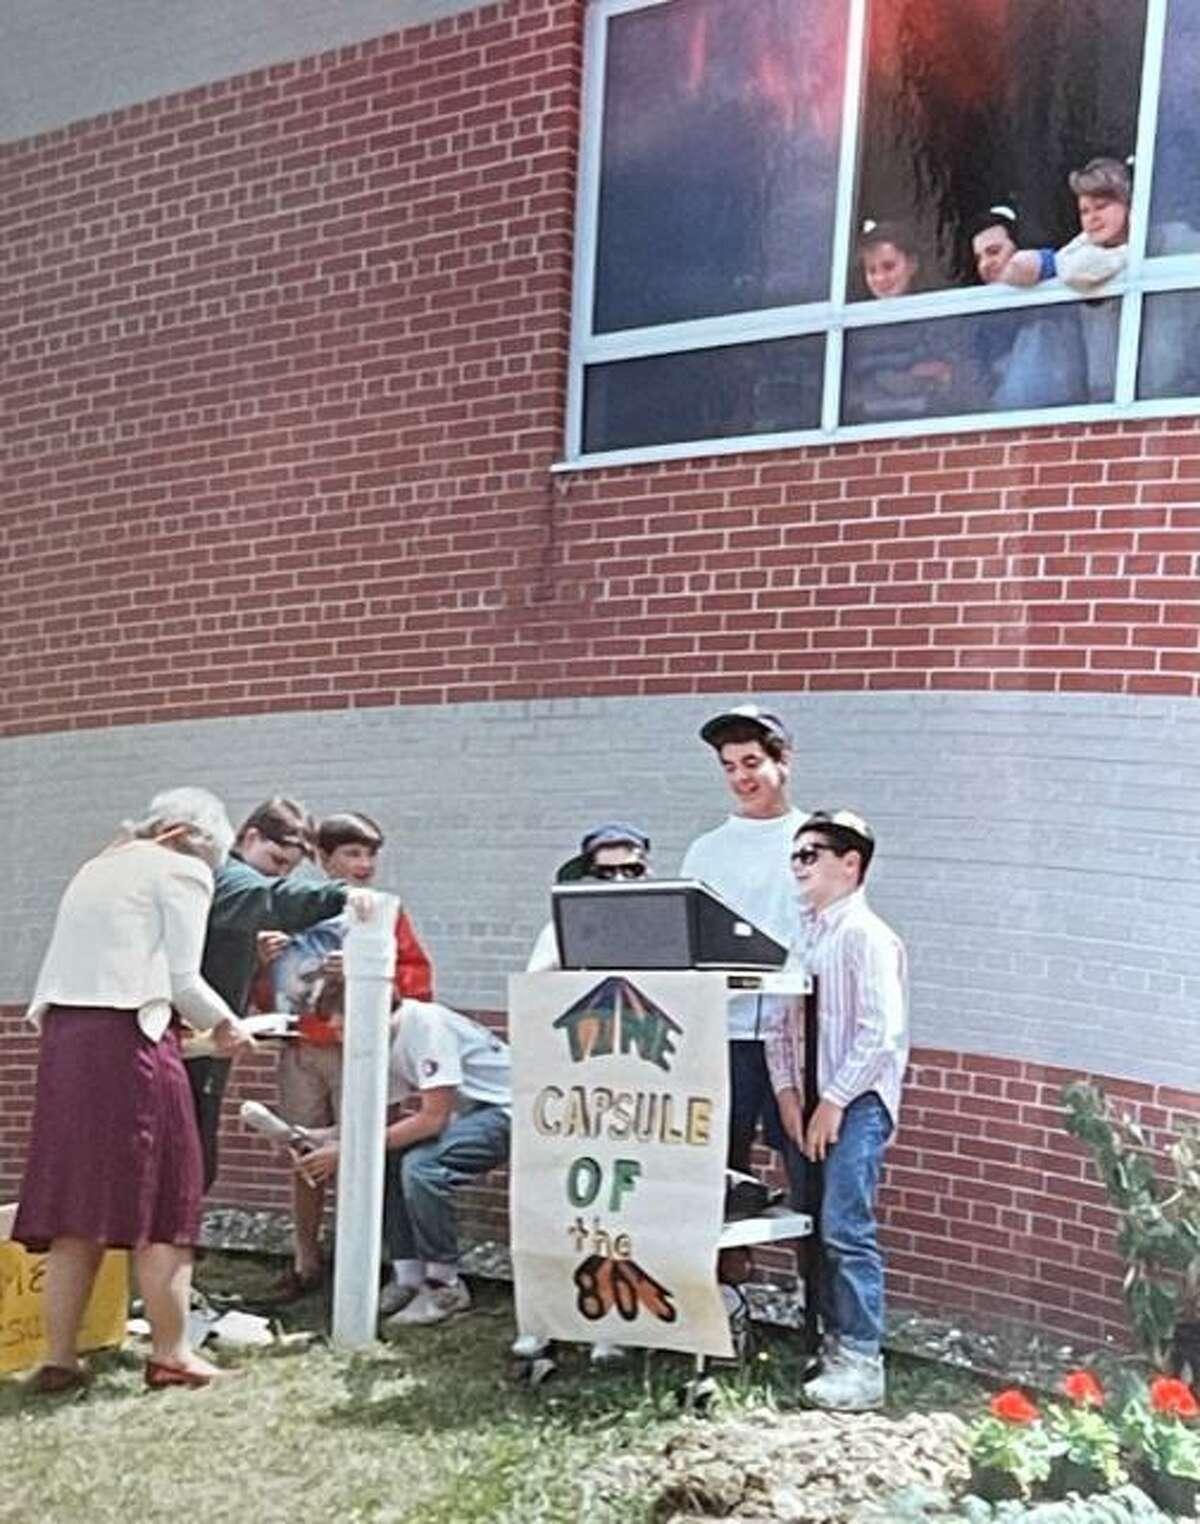 East Ridge Middle School students bury a time capsule on June 6, 1990.